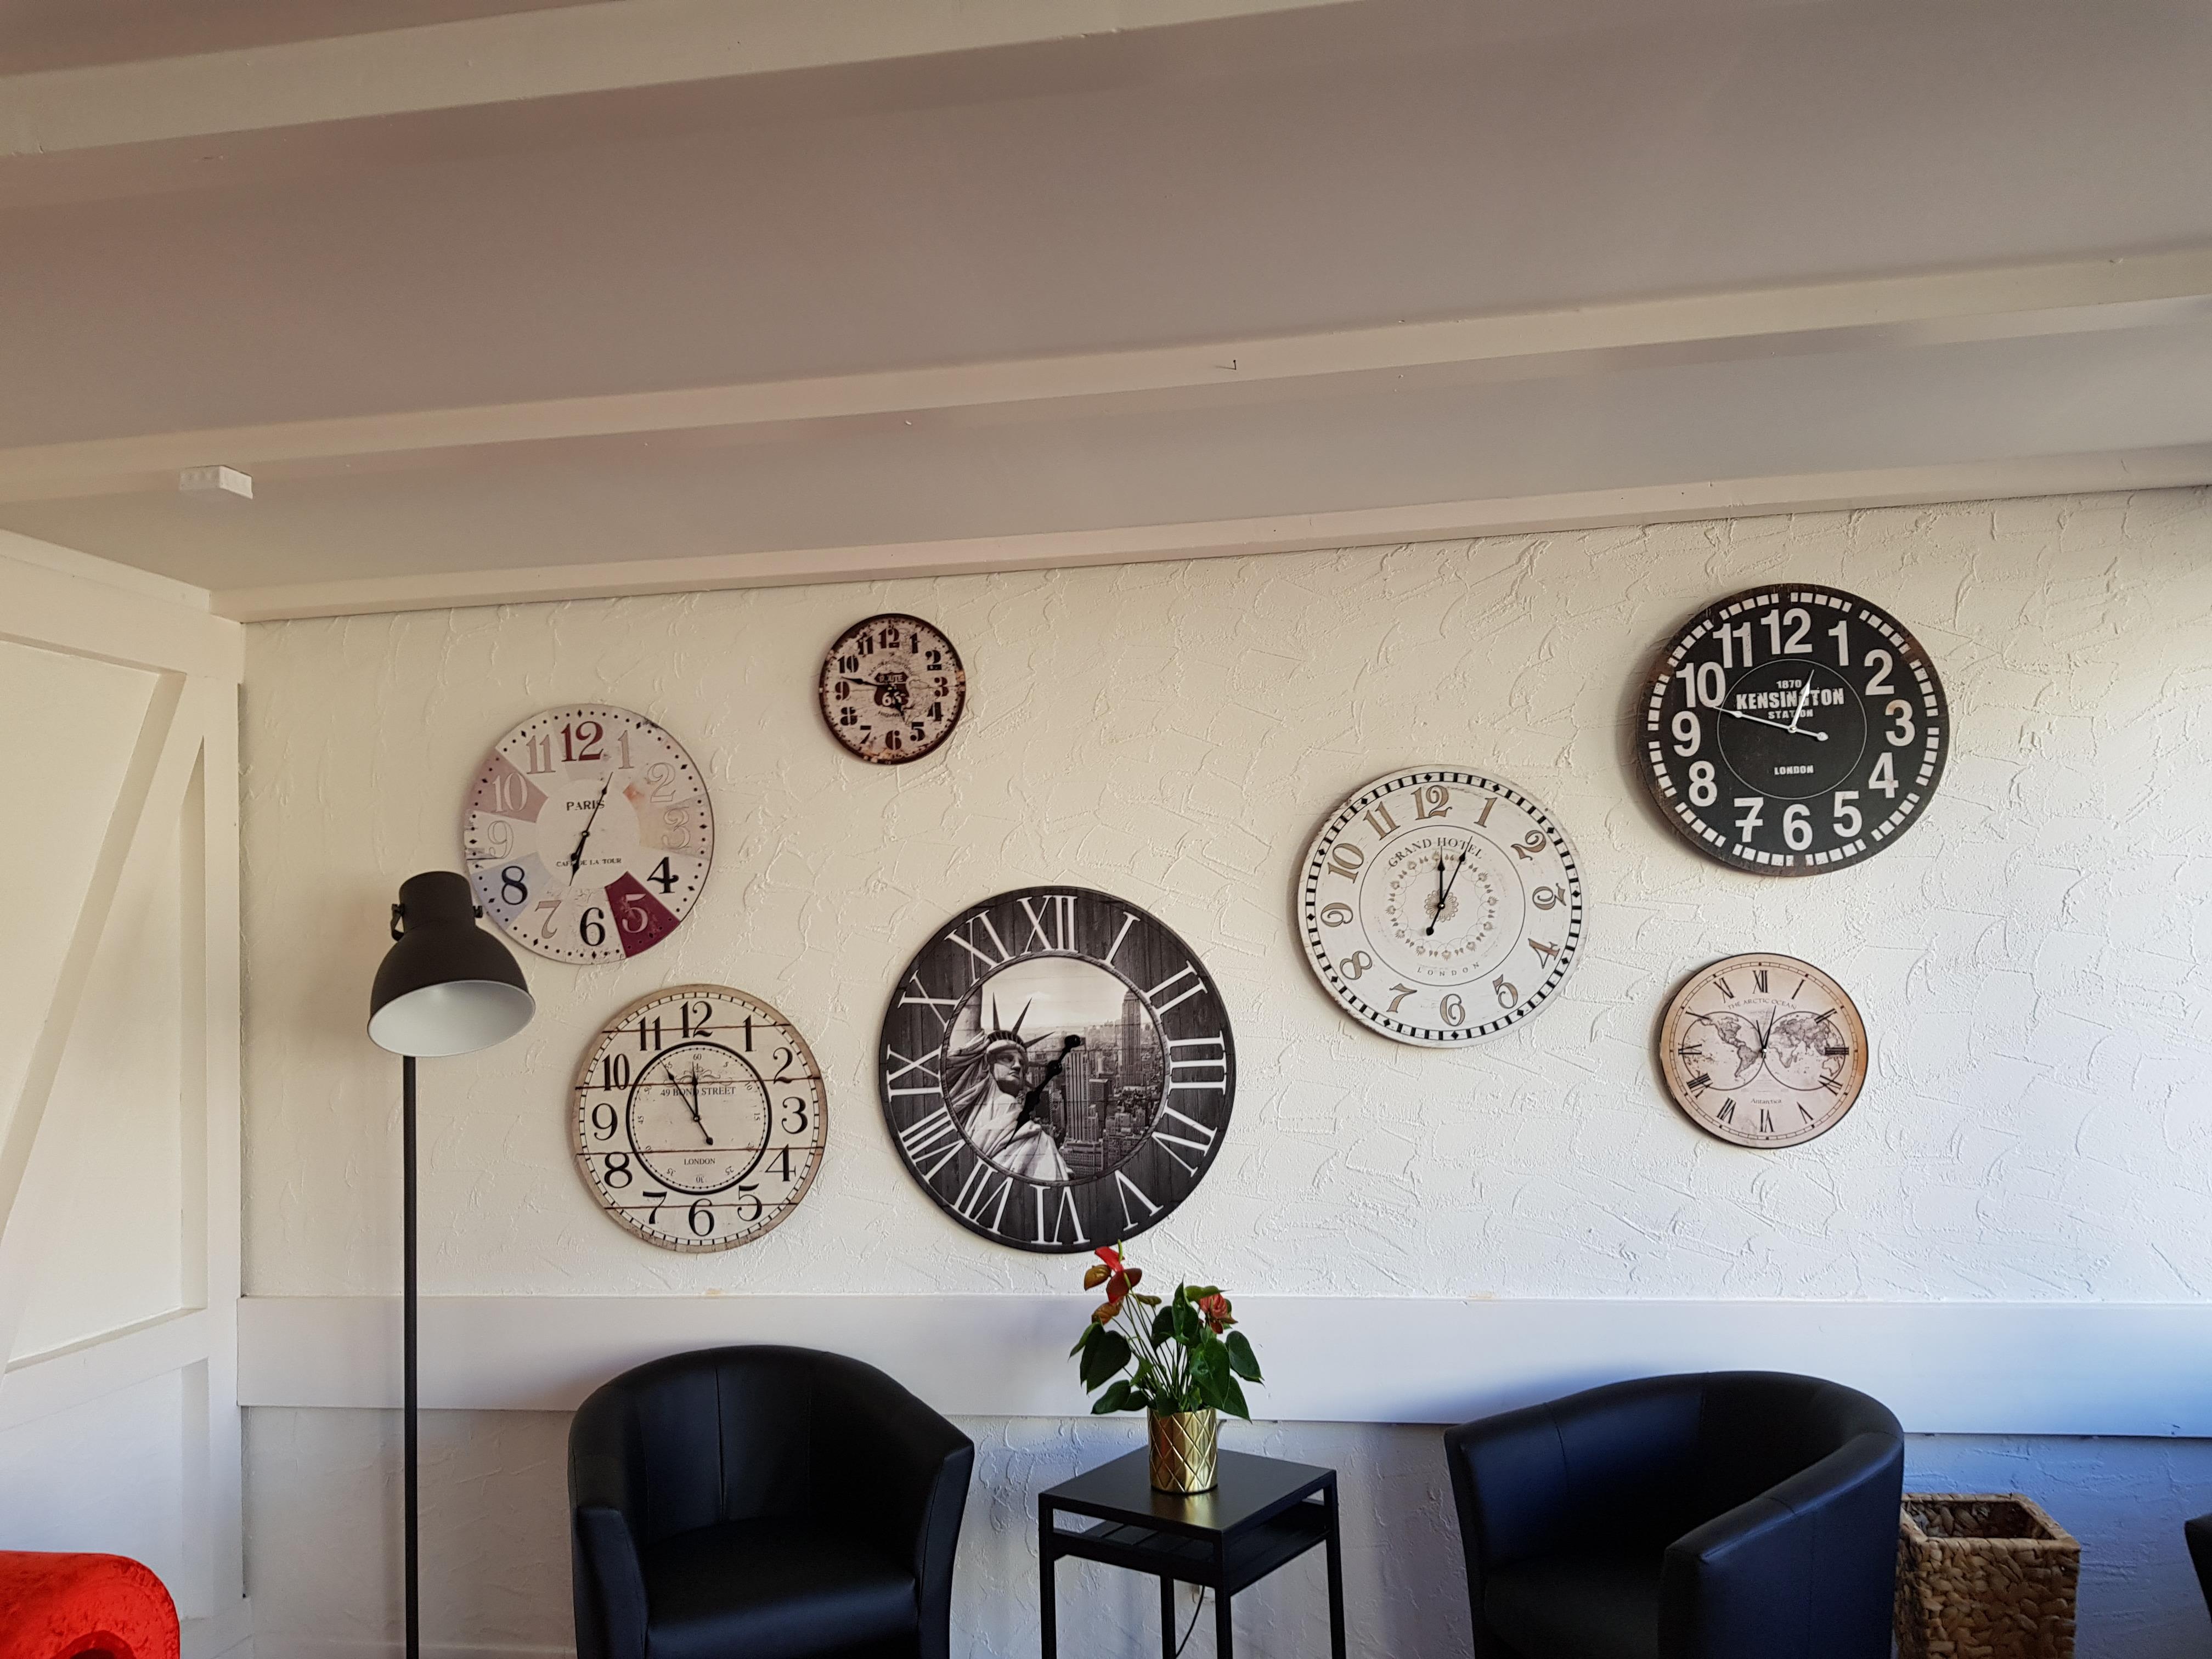 T8 Lobby Uhren